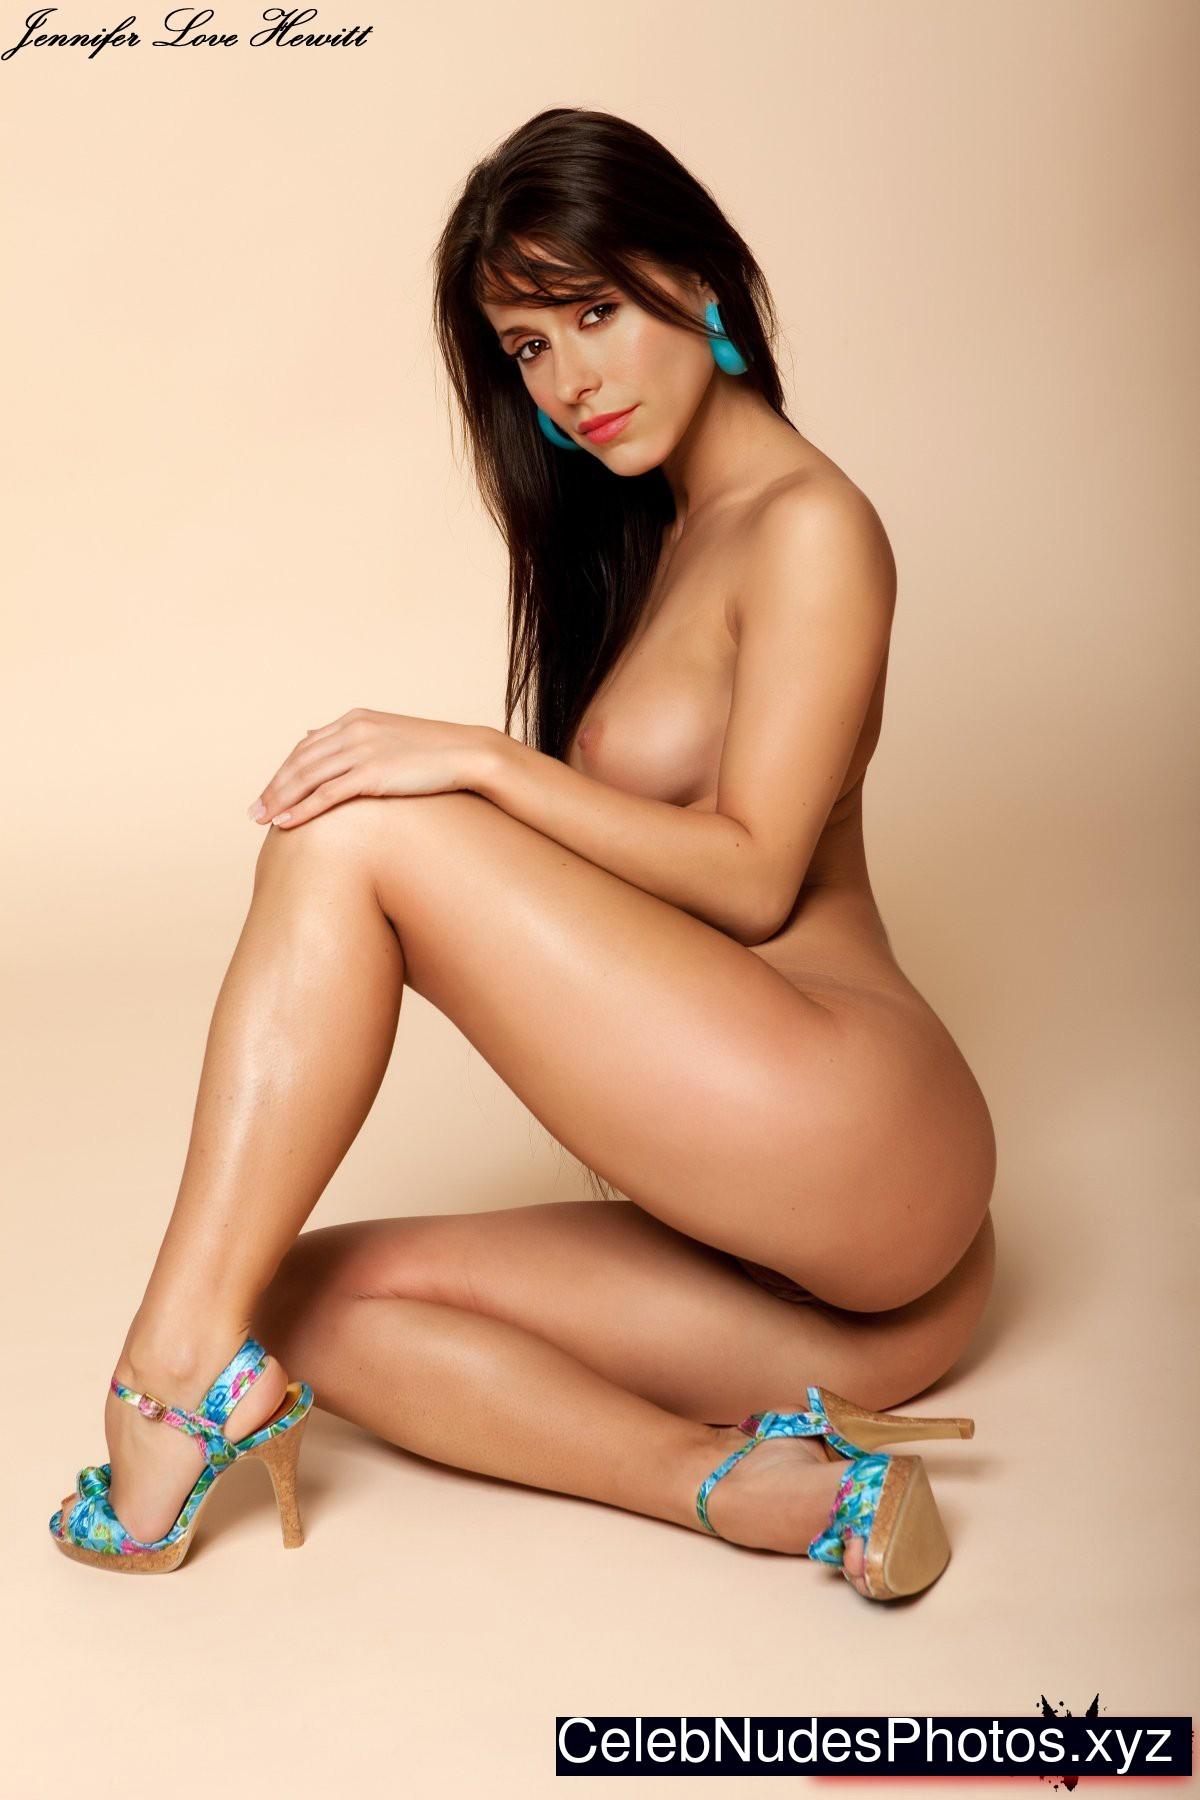 Necessary words... Jennifer love hewitt topless that